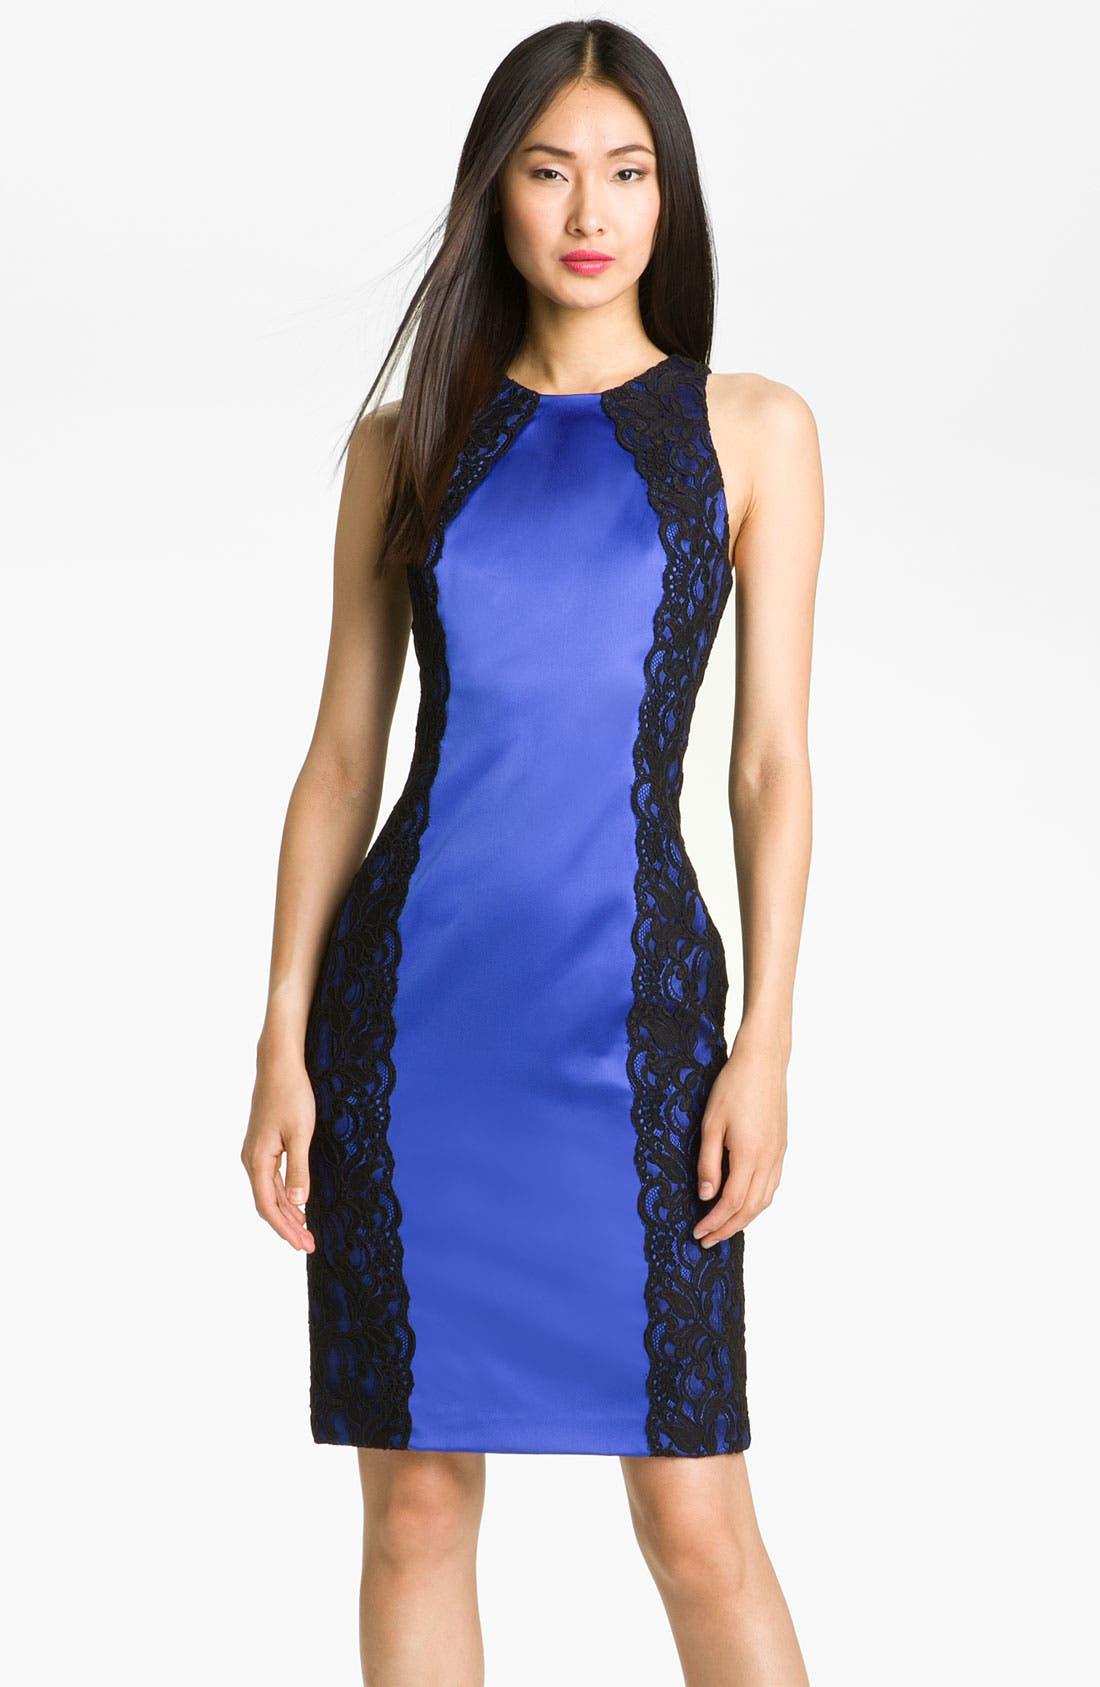 Alternate Image 1 Selected - David Meister Lace & Satin Sheath Dress